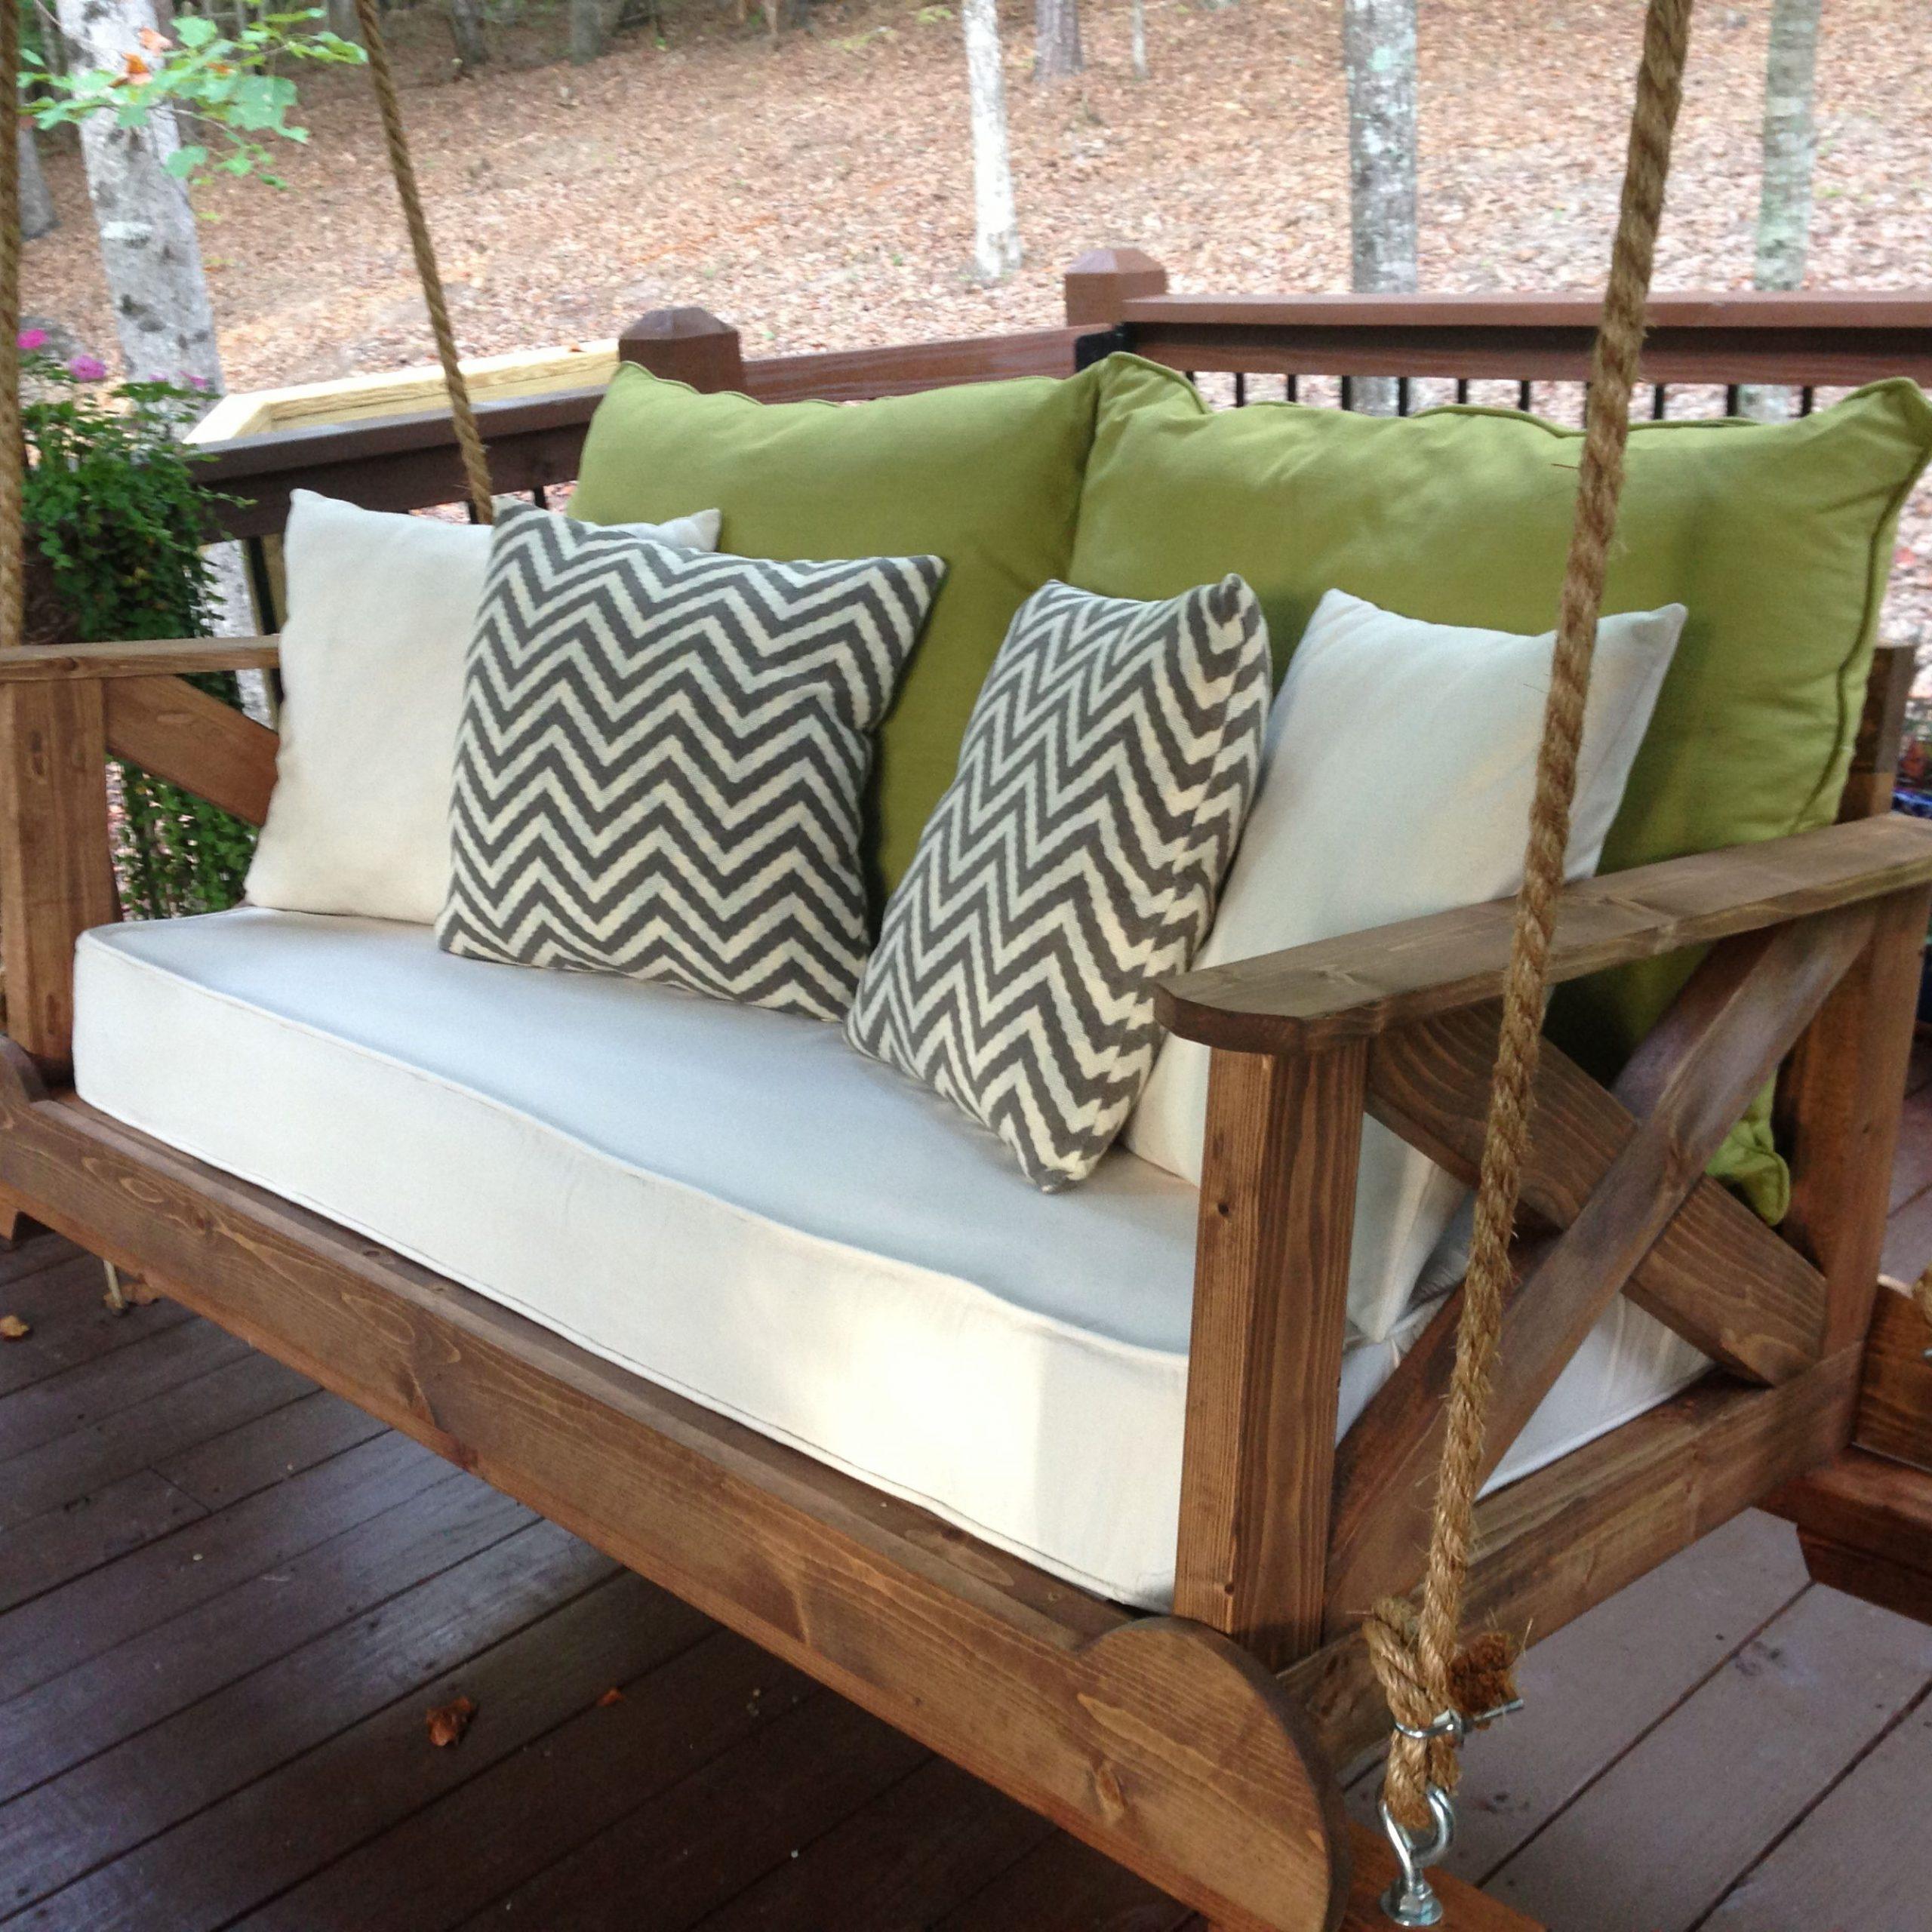 [%56 Diy Porch Swing Plans [free Blueprints] | Porch Swing With Regard To Newest Porch Swings|porch Swings Inside Most Current 56 Diy Porch Swing Plans [free Blueprints] | Porch Swing|famous Porch Swings Regarding 56 Diy Porch Swing Plans [free Blueprints] | Porch Swing|best And Newest 56 Diy Porch Swing Plans [free Blueprints] | Porch Swing Pertaining To Porch Swings%] (View 2 of 30)